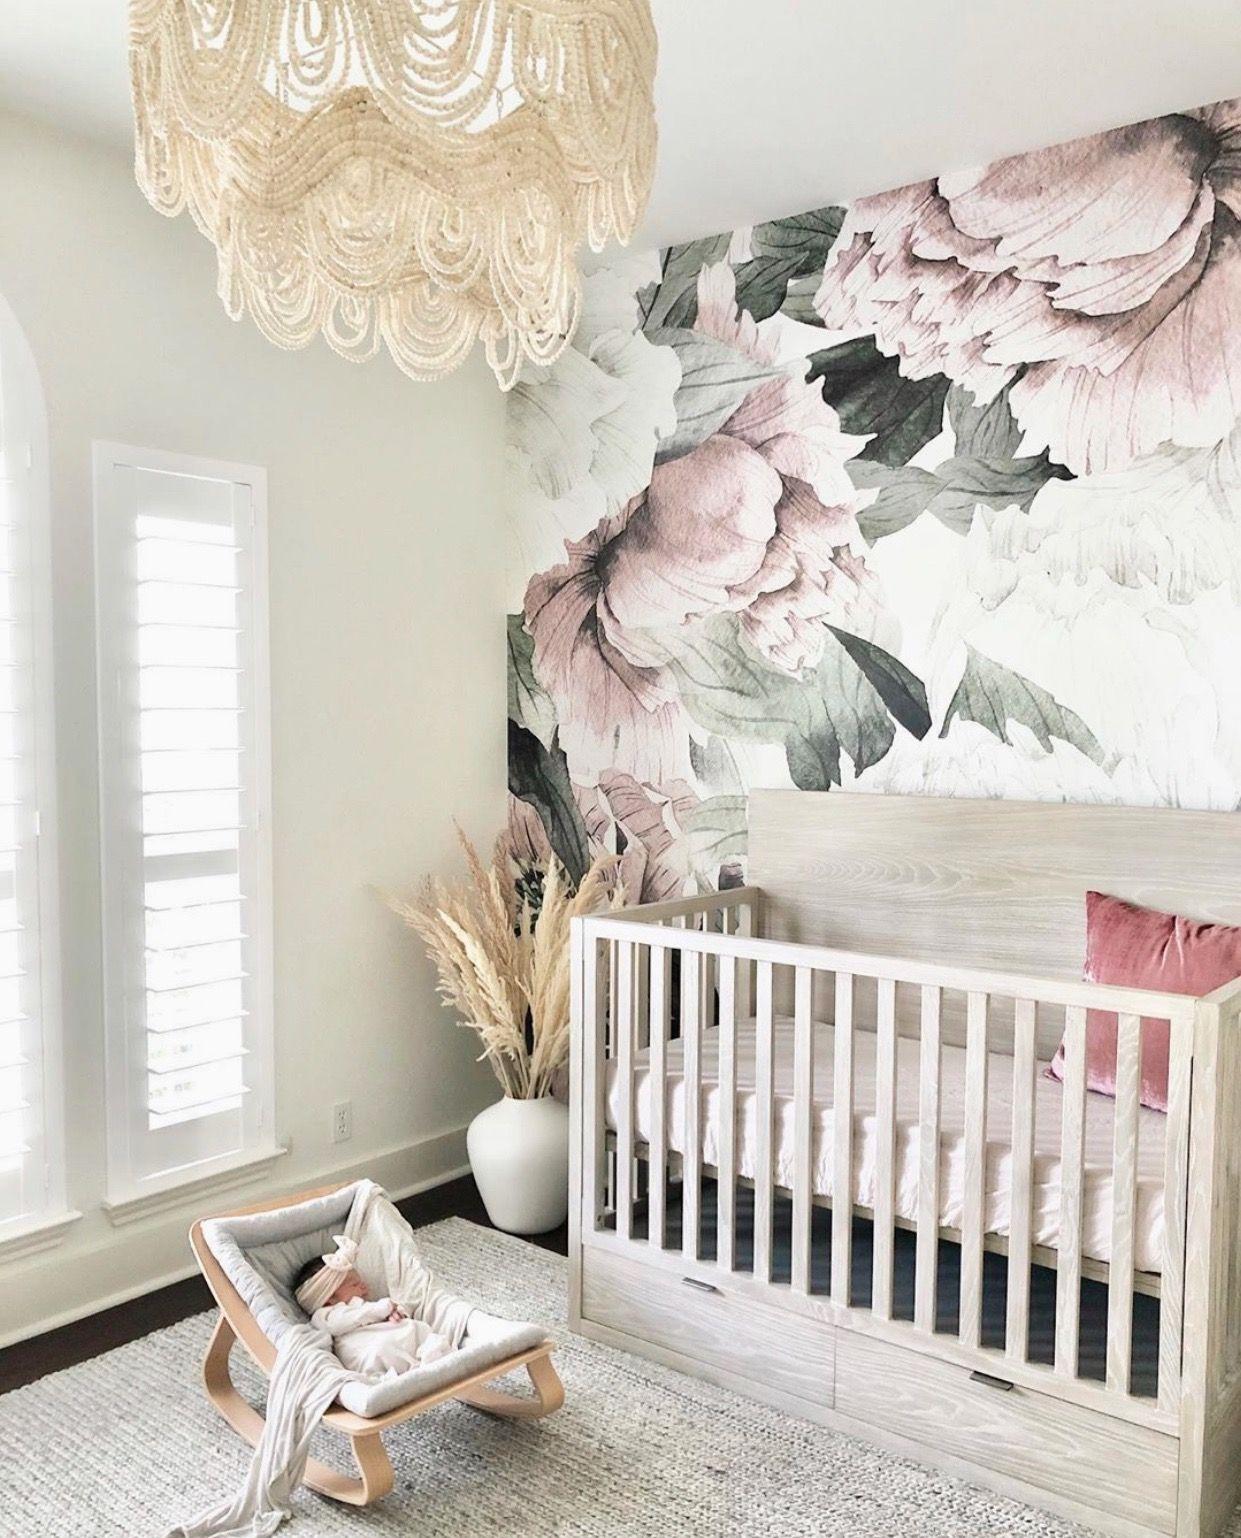 Blush Floral Wallpaper In 2021 Floral Wallpaper Nursery Girl Nursery Room Girl Nursery Wallpaper